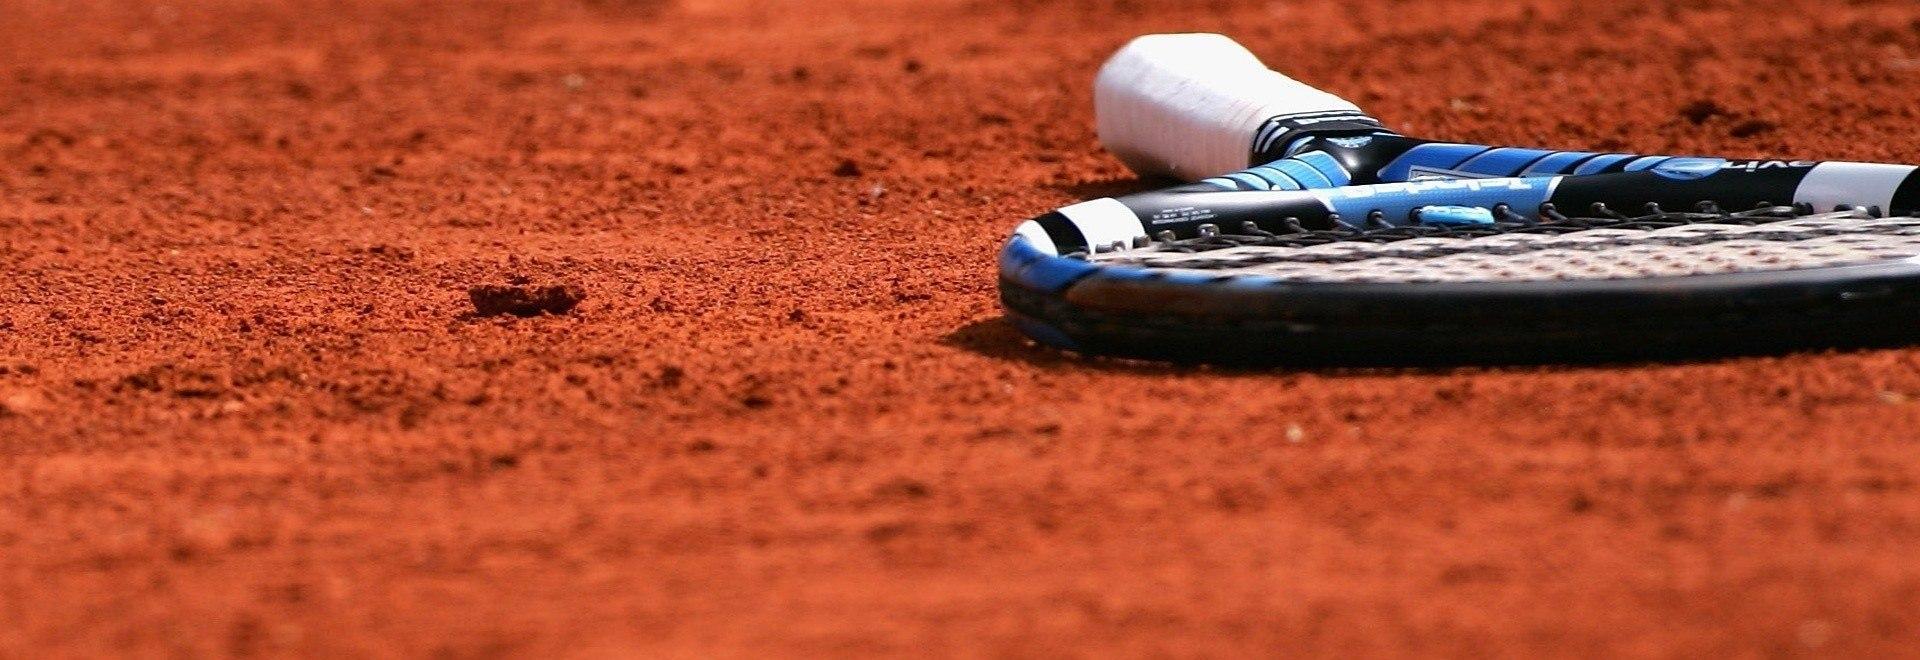 ATP World Tour Masters 1000 HL 2014